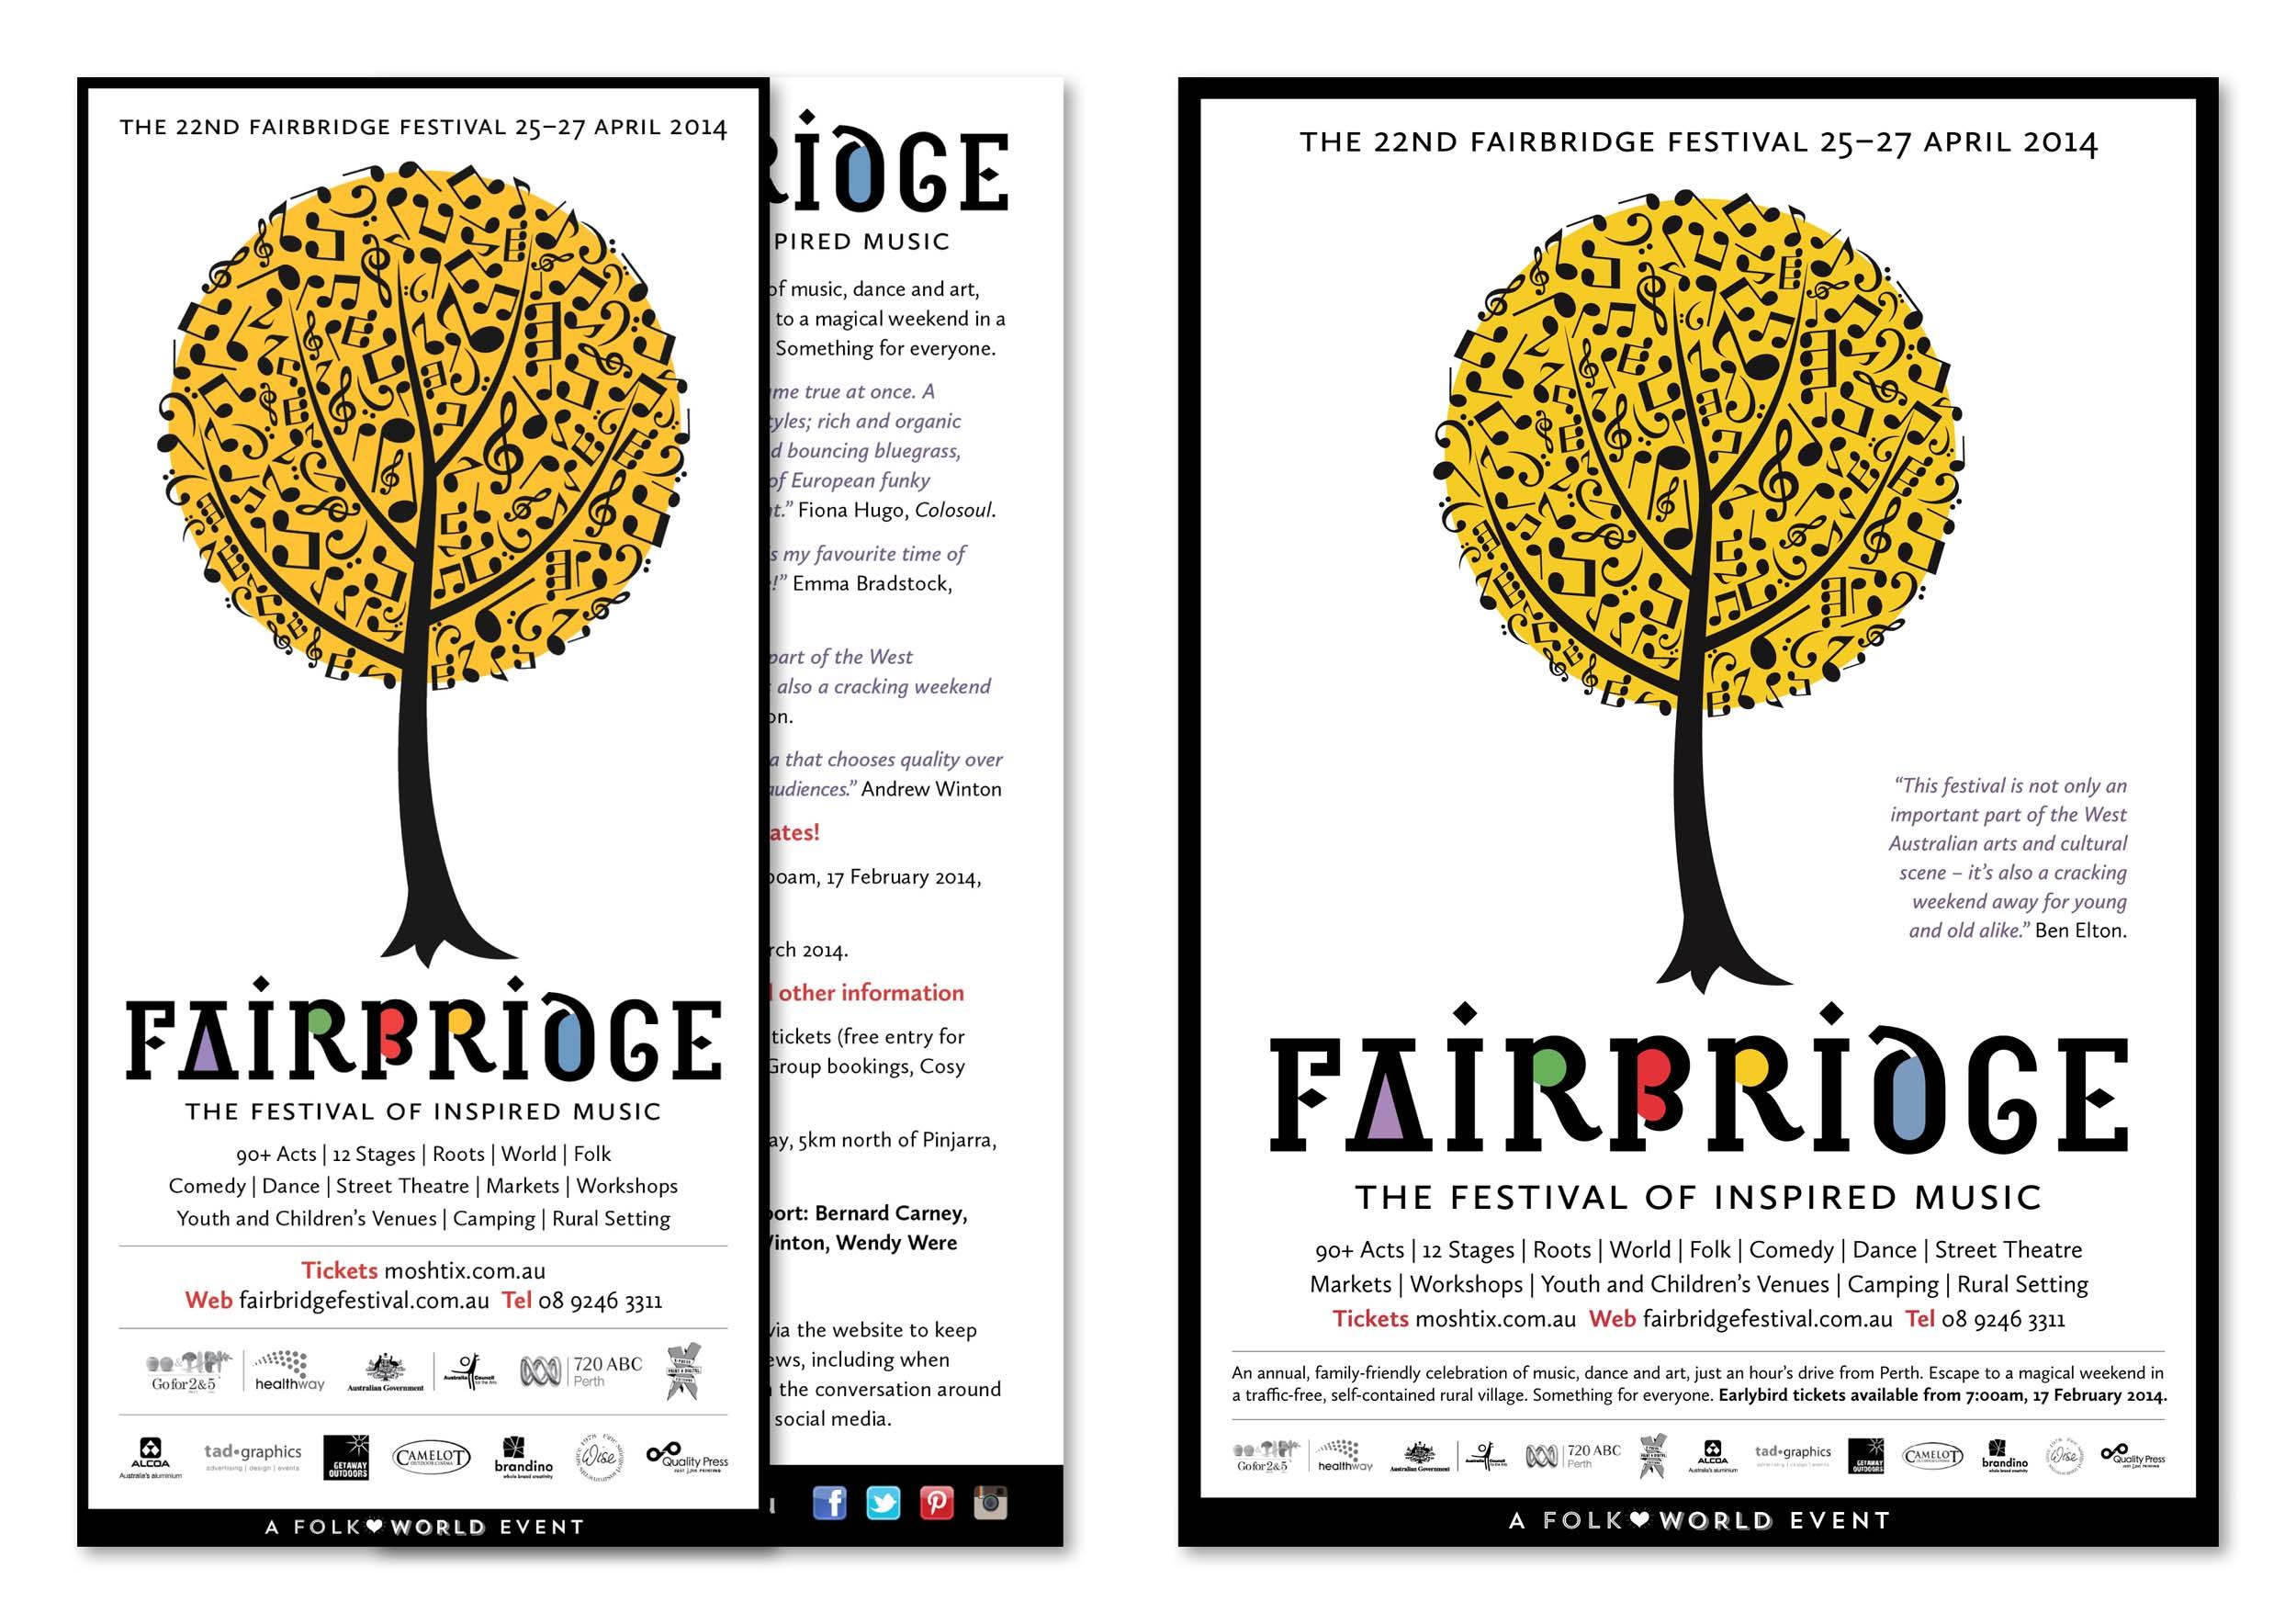 Fairbridge Brand and Theme.jpg